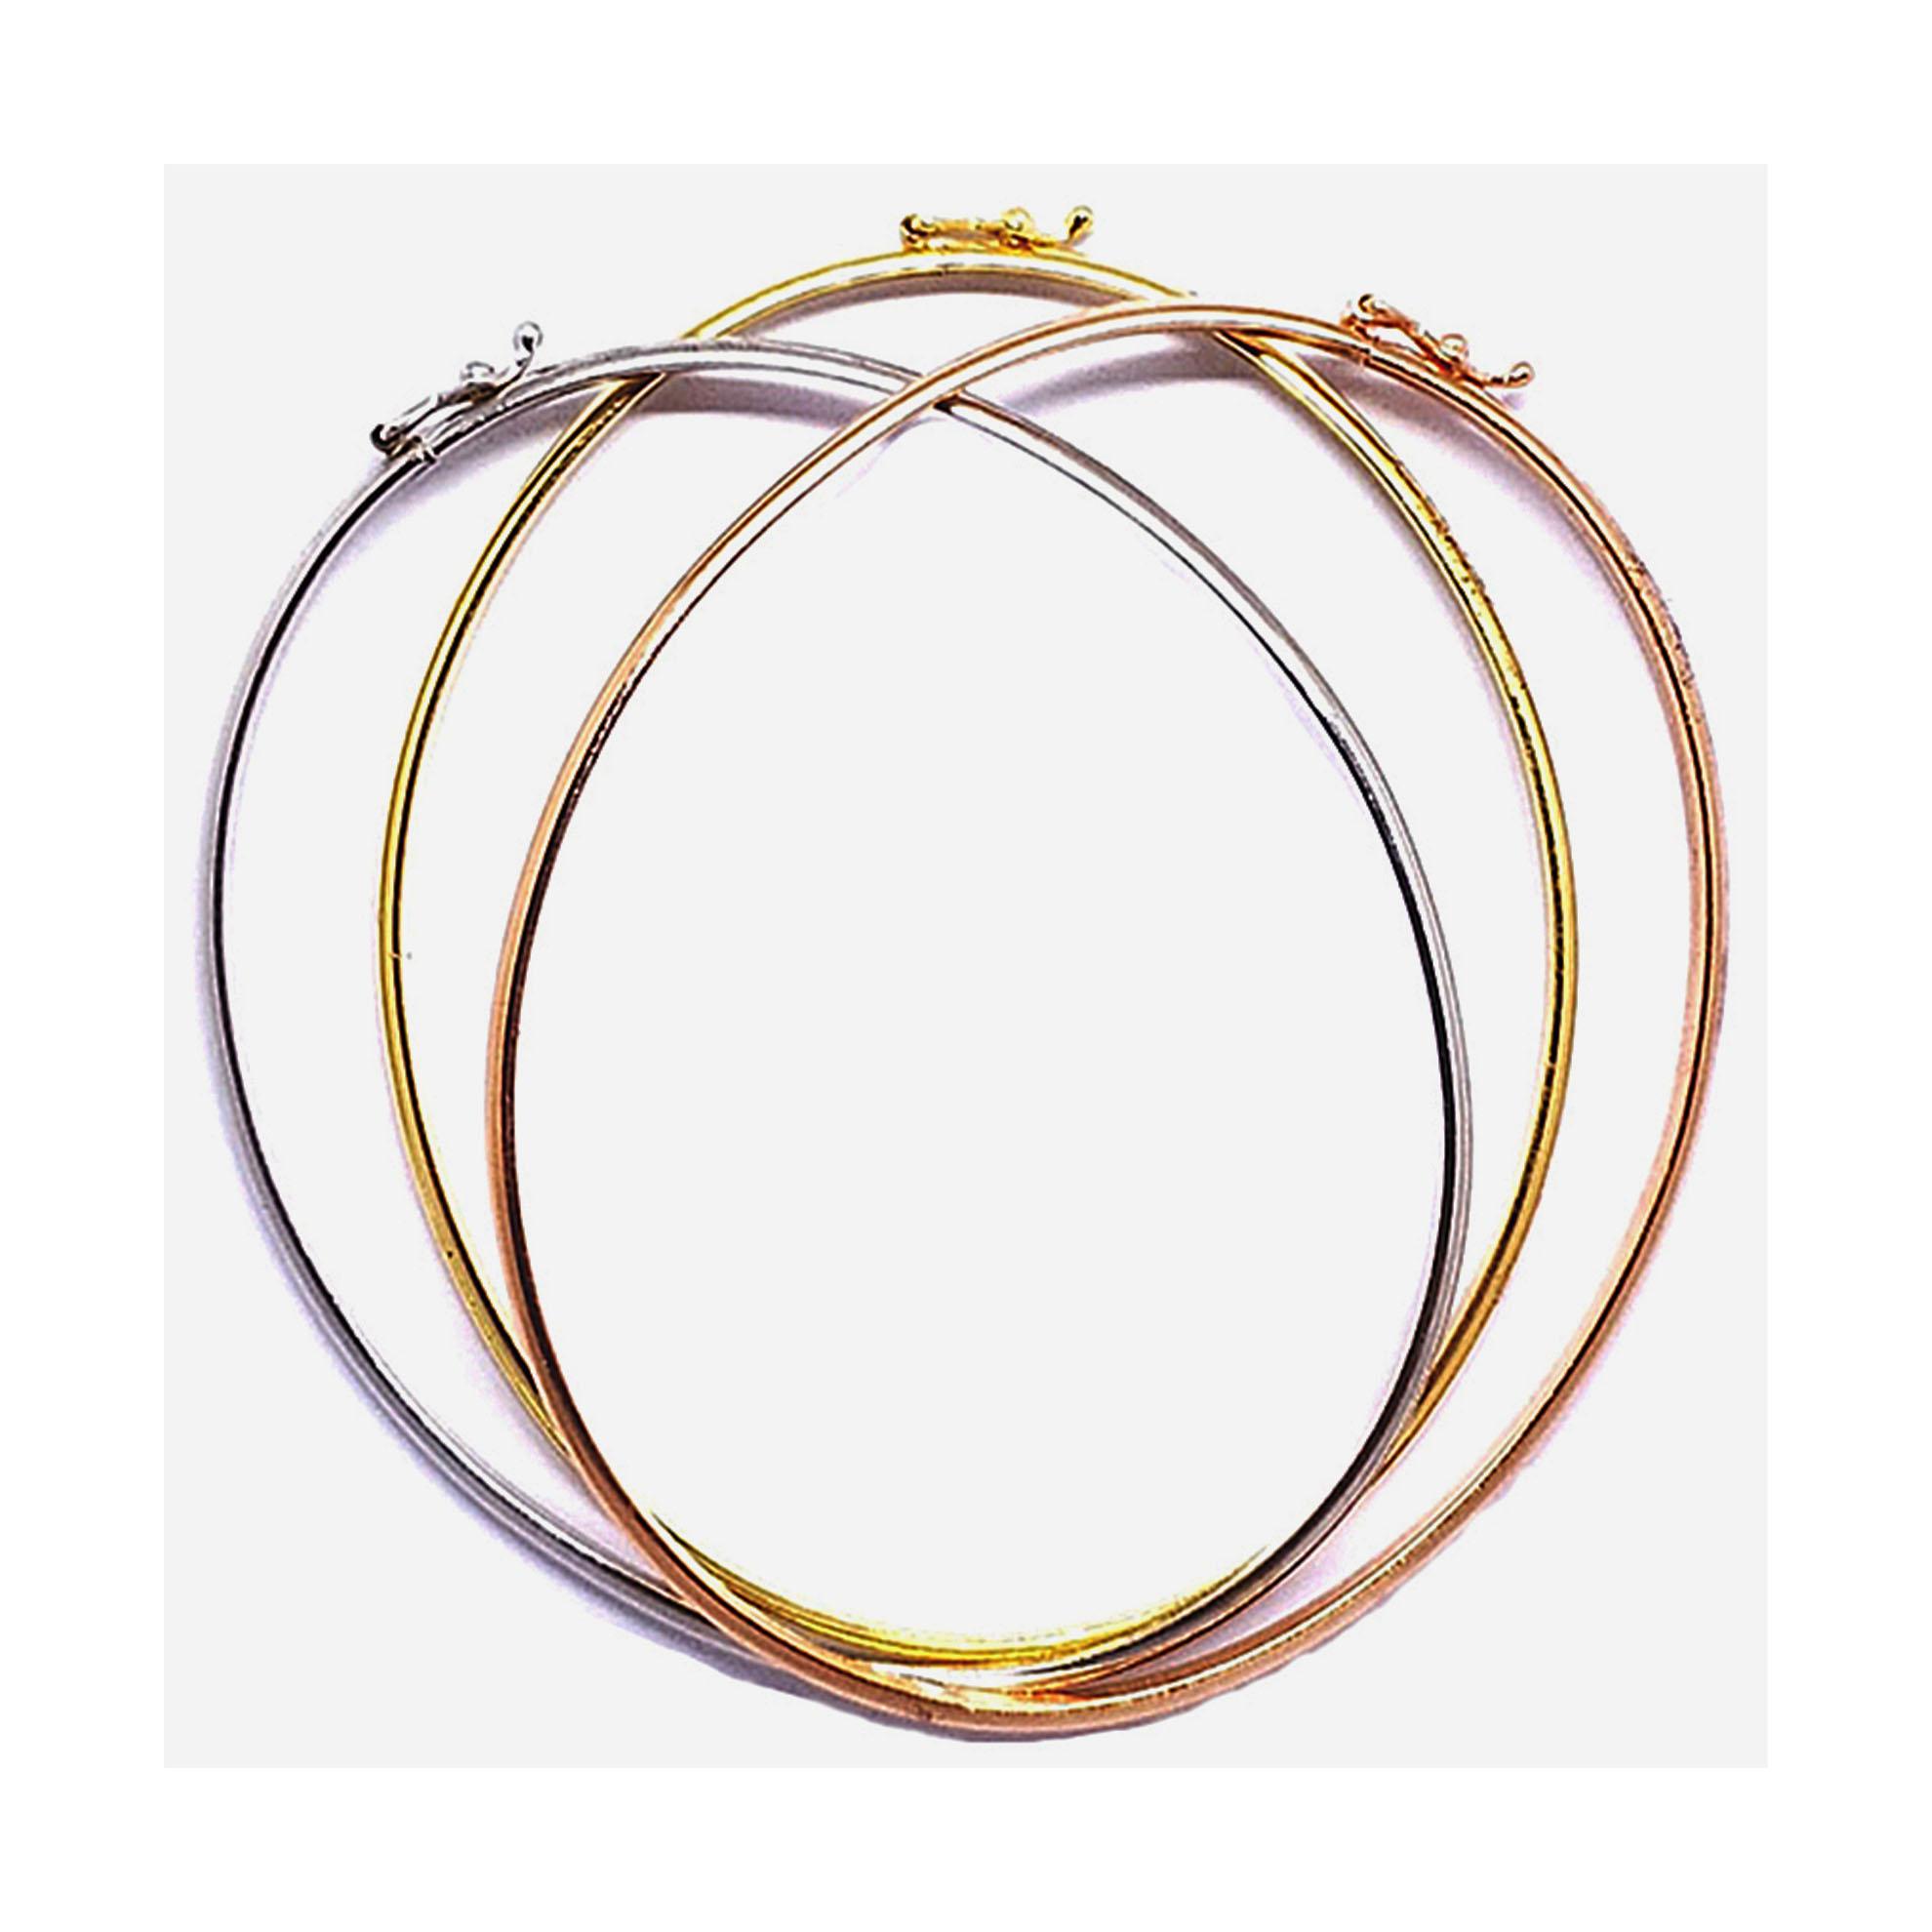 Bracelete Oval em Ouro Branco 18 Kilates